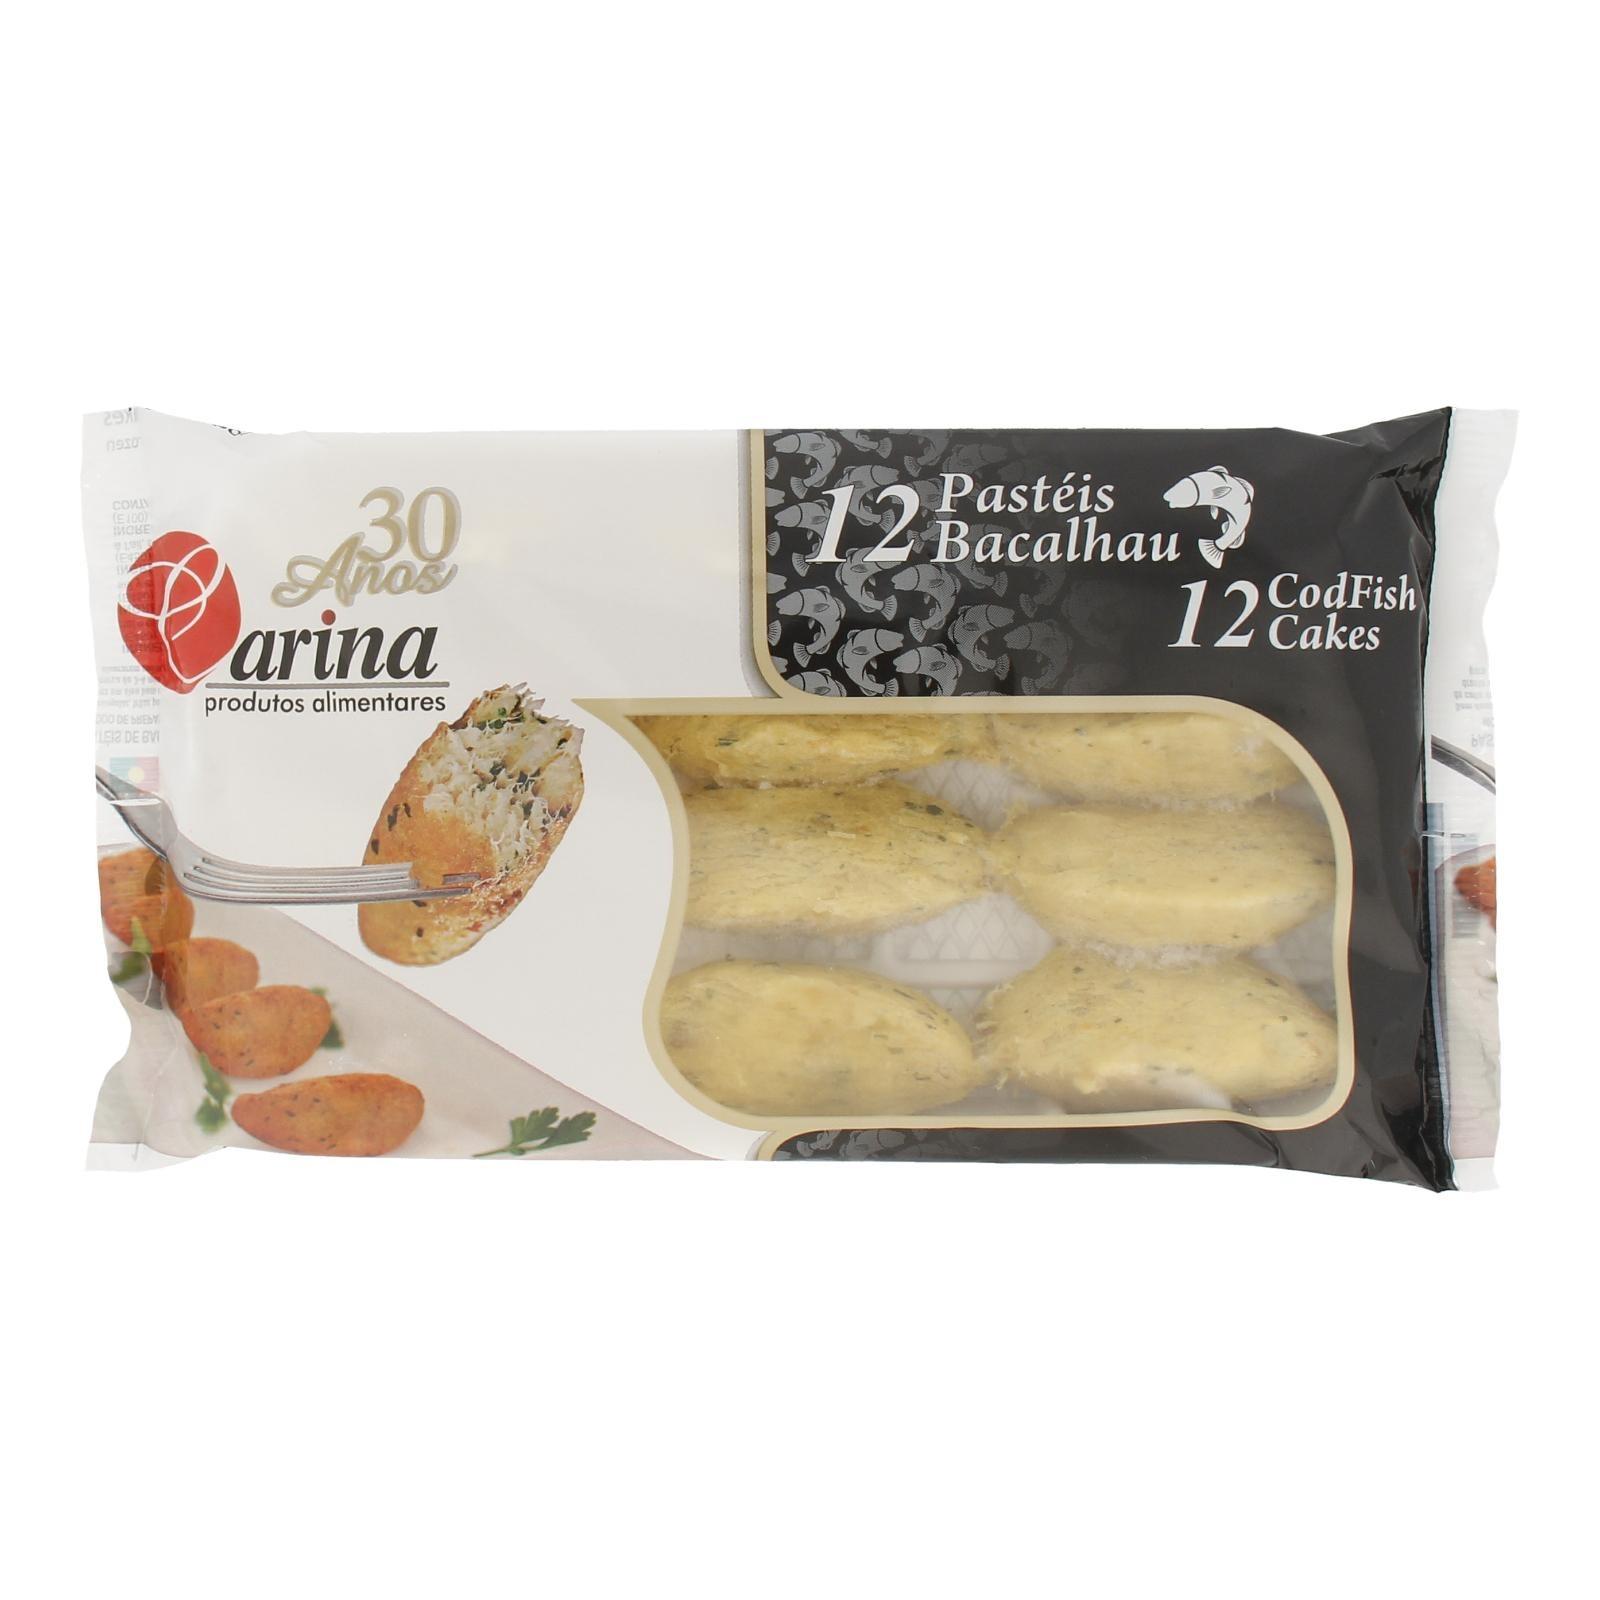 Carina Pasteis De Bacalhau Cod Fish Cakes 12s